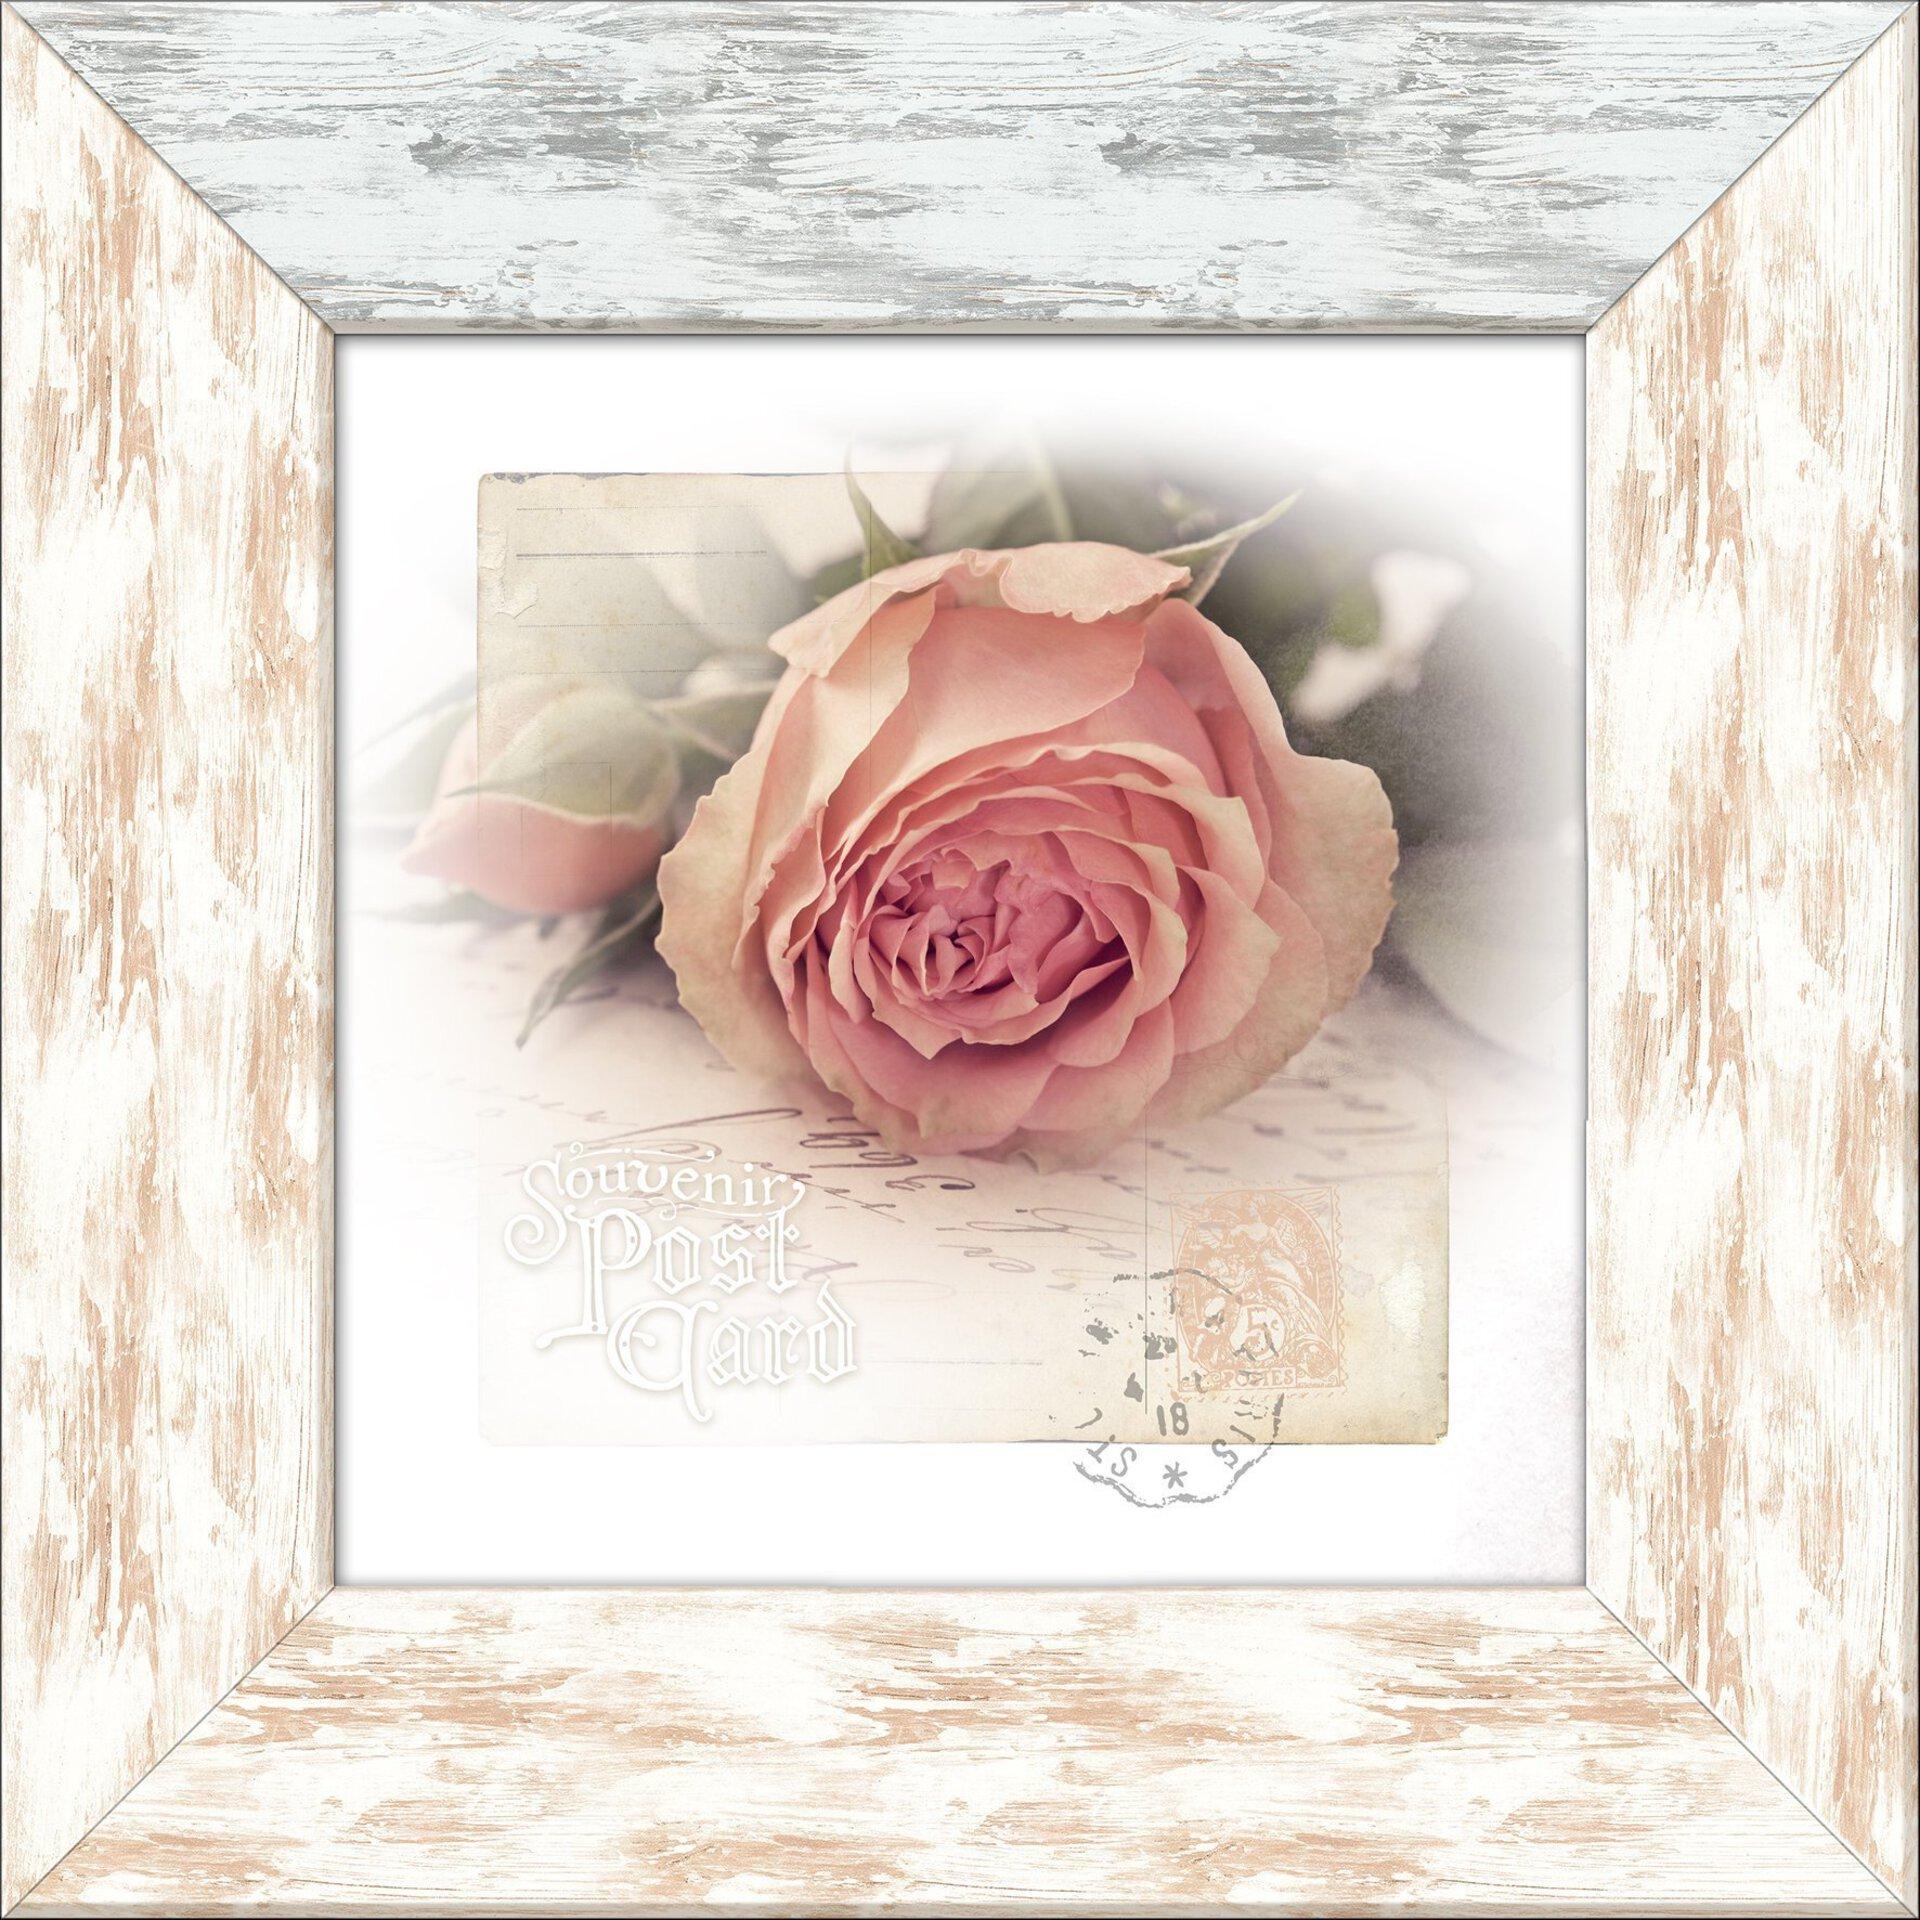 Bild Herbstrose II Pro-Art Holzwerkstoff mehrfarbig 44 x 44 x 1 cm